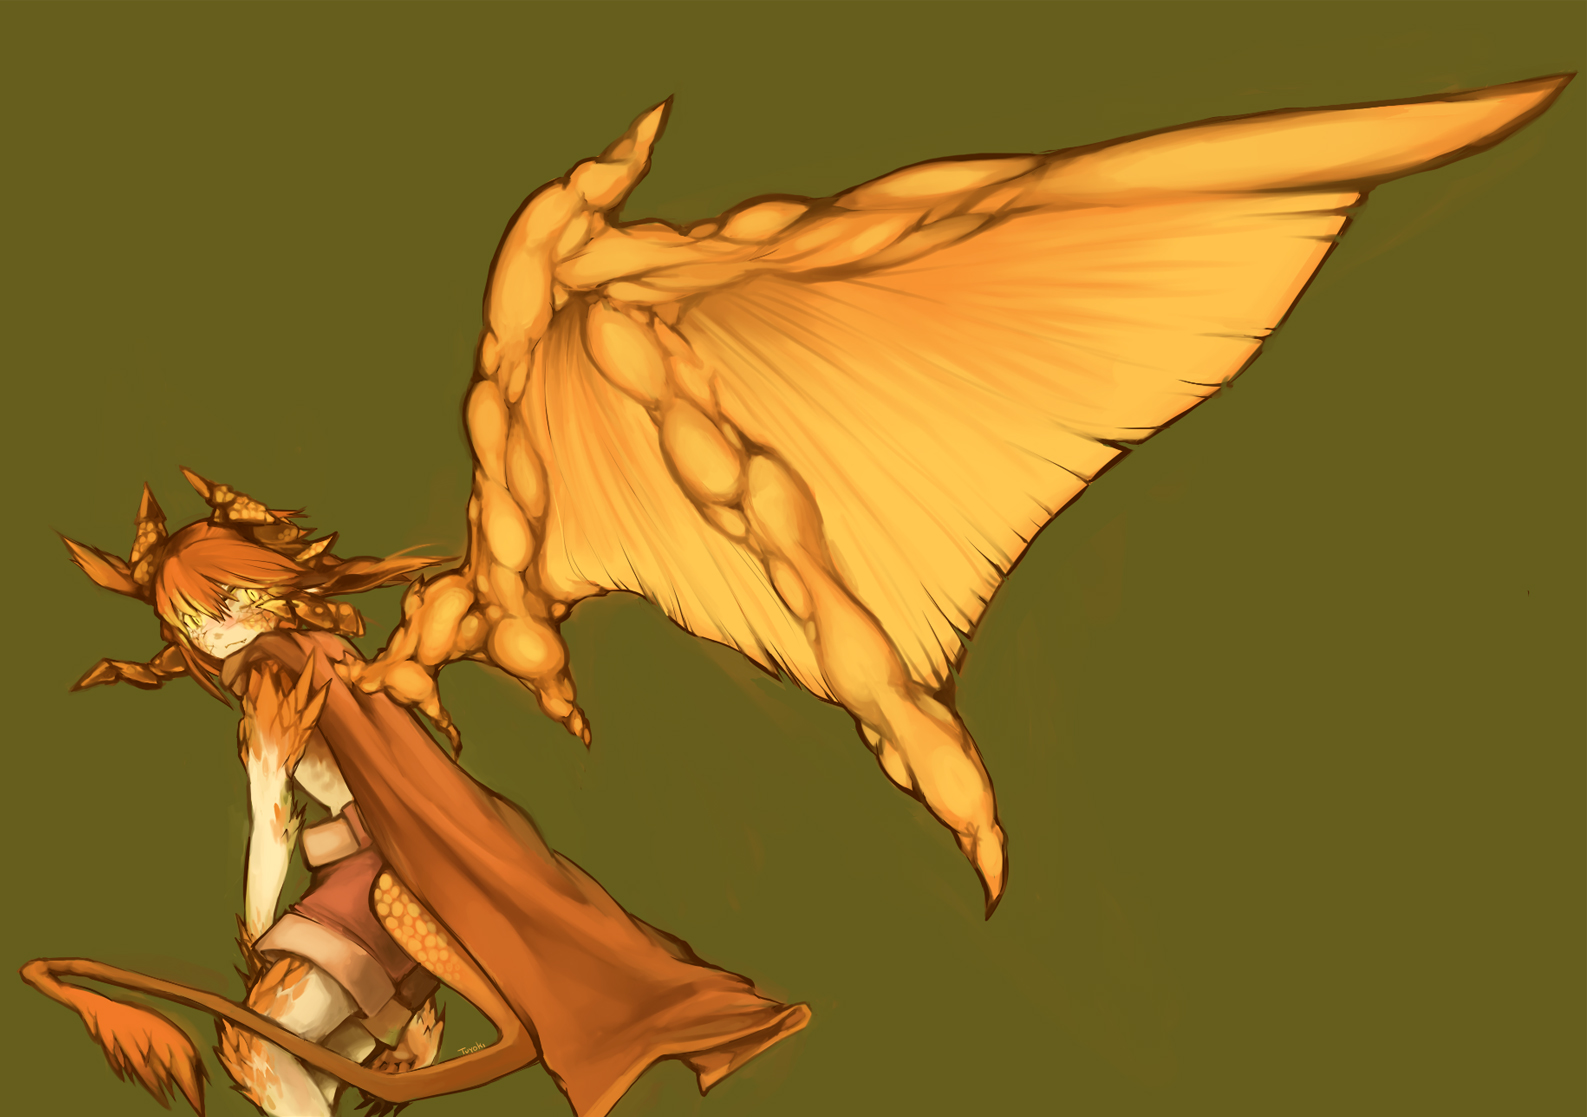 Dragon boy by tuyoki on deviantart - Anime boy dragon ...